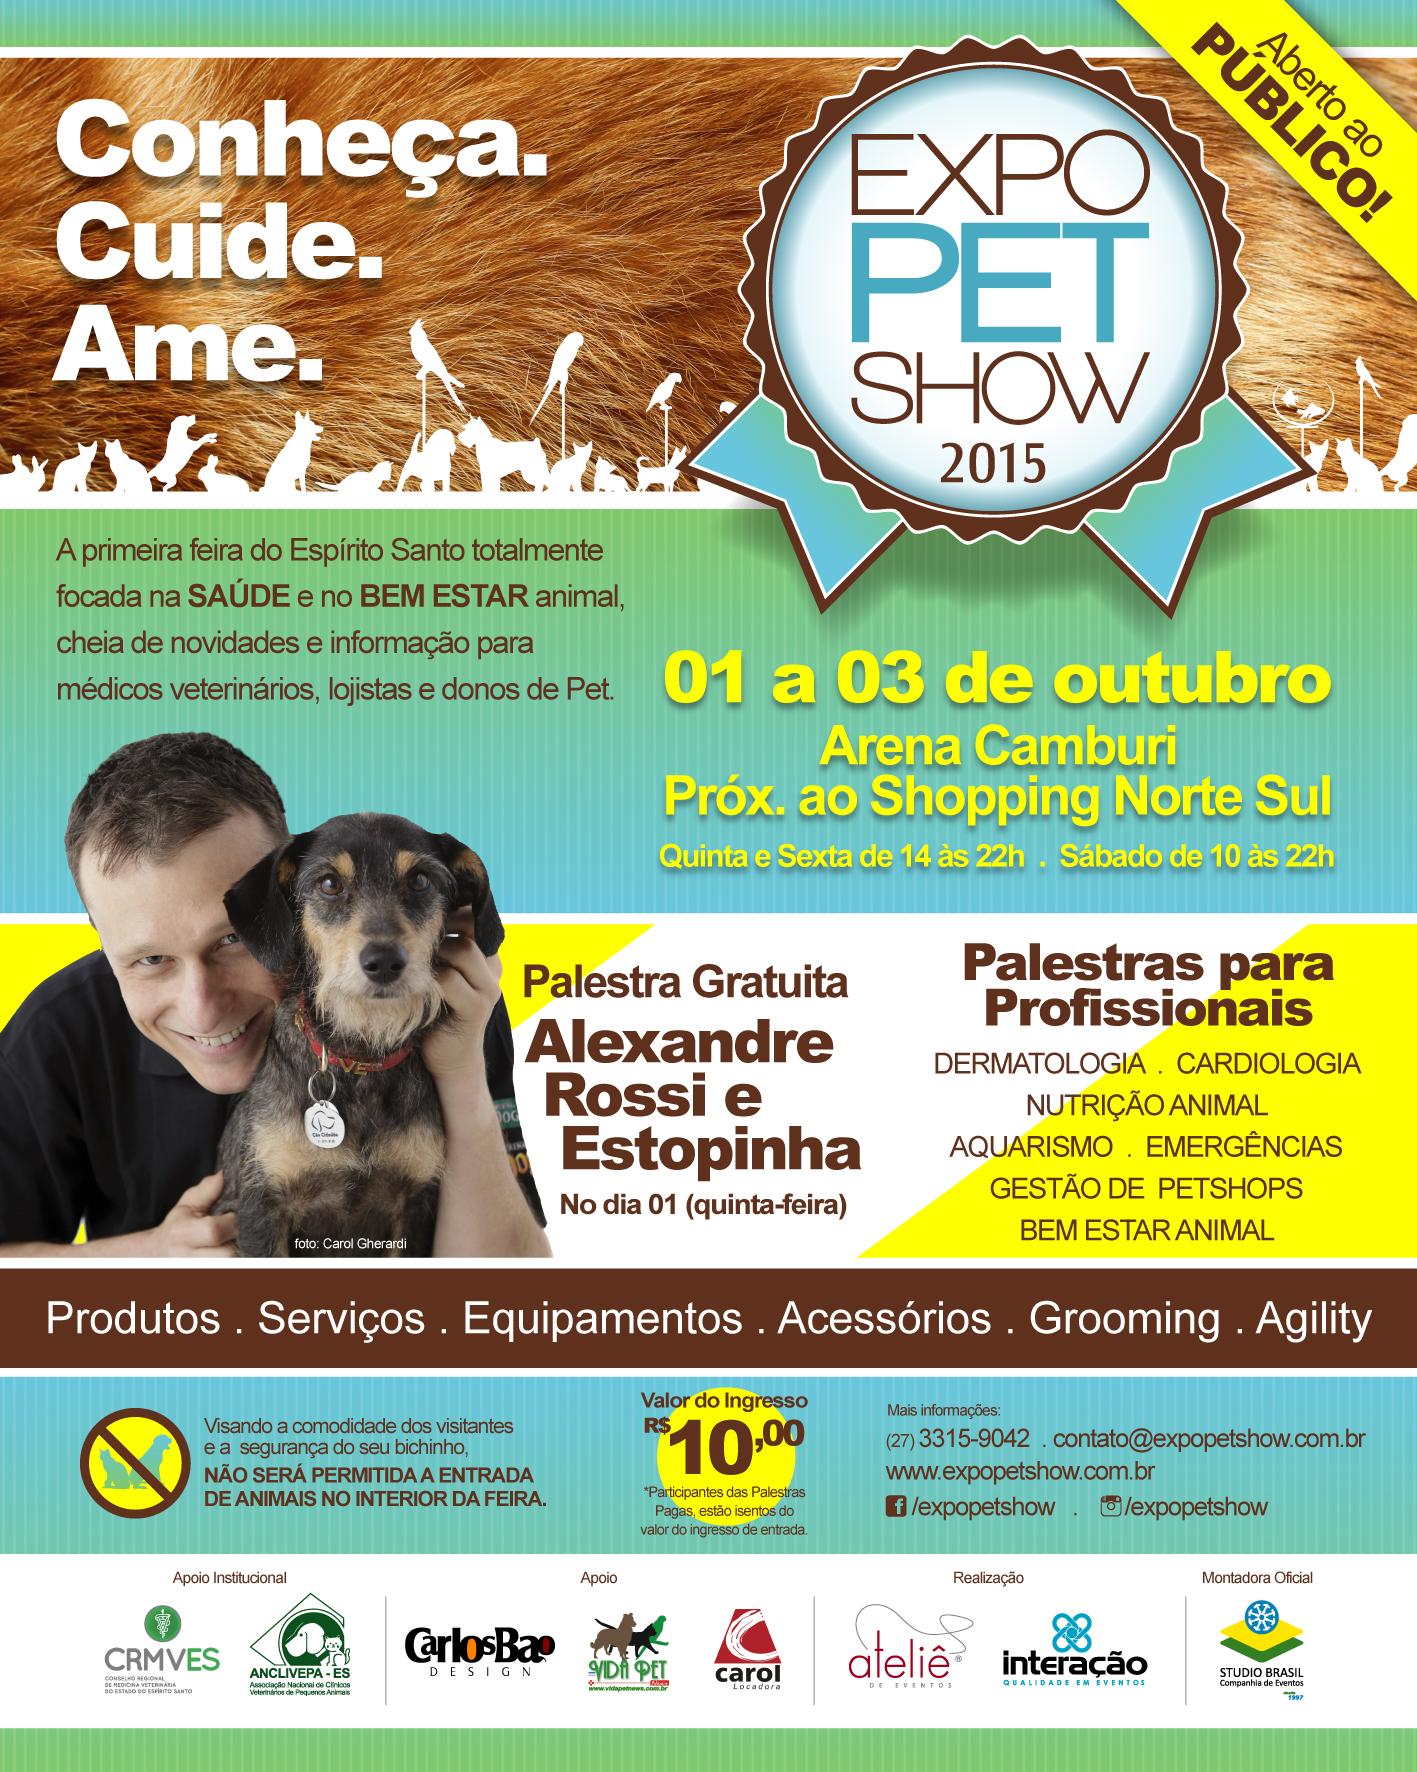 Expo Pet Show 2015